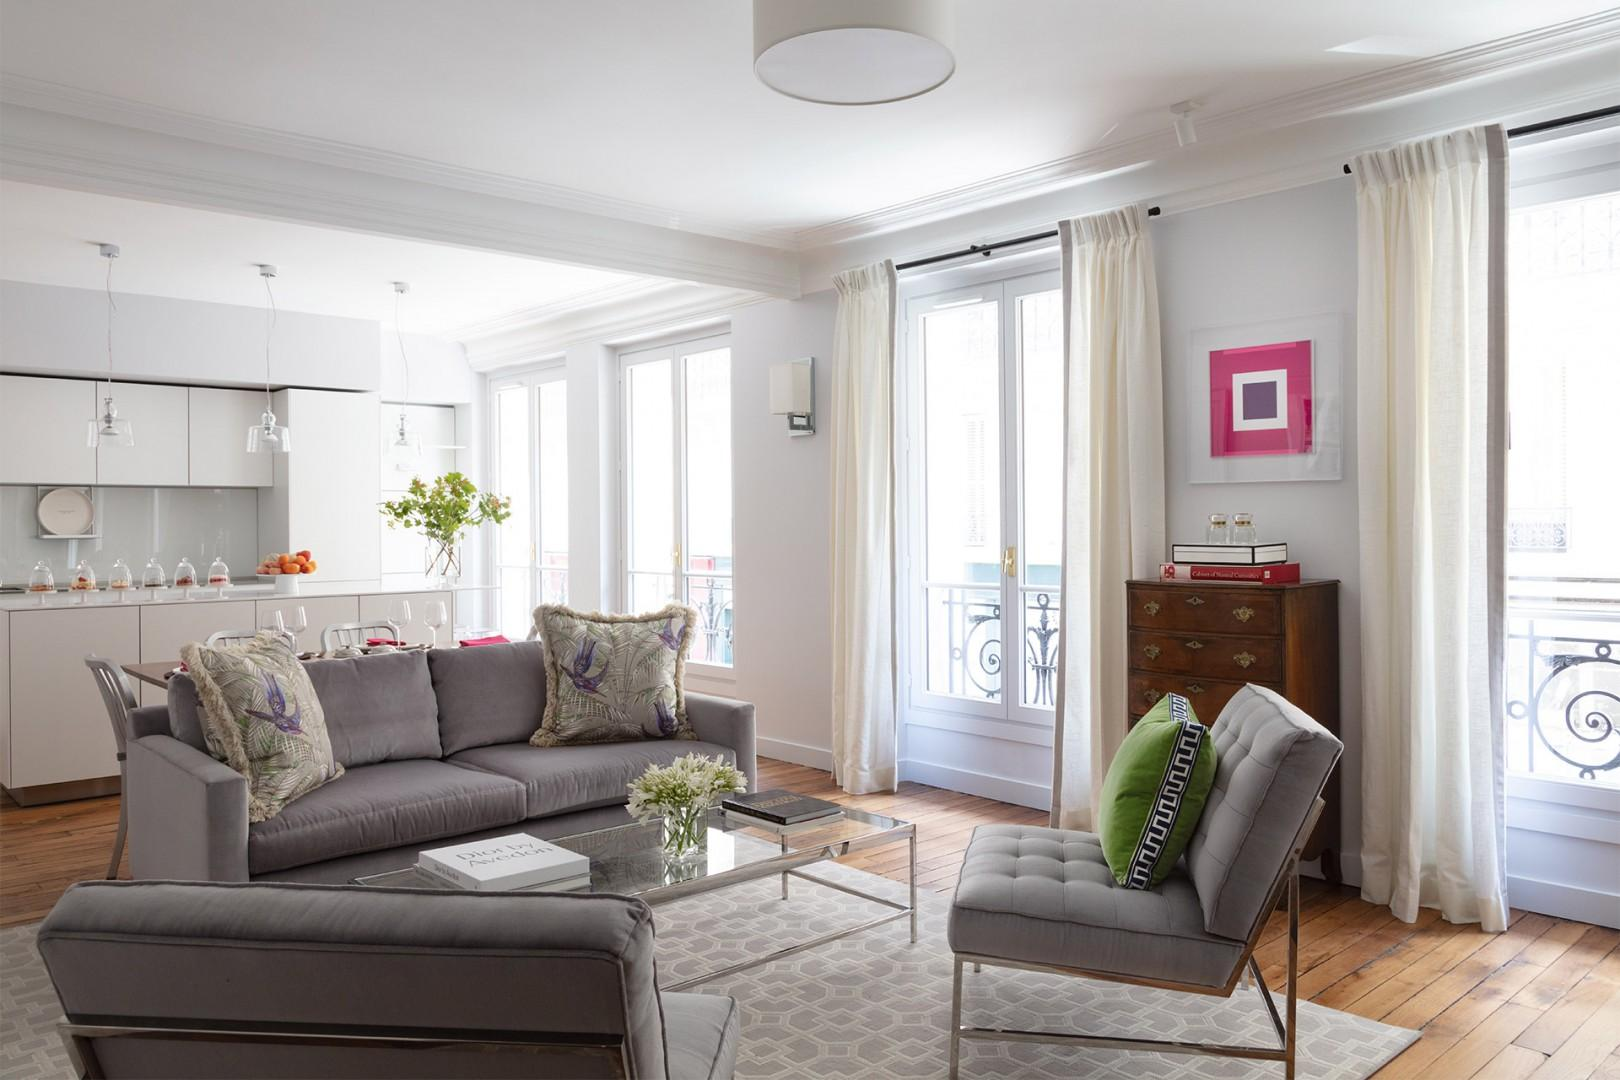 Welcome to the luxurious Saint-Pourcain Paris vacation rental!